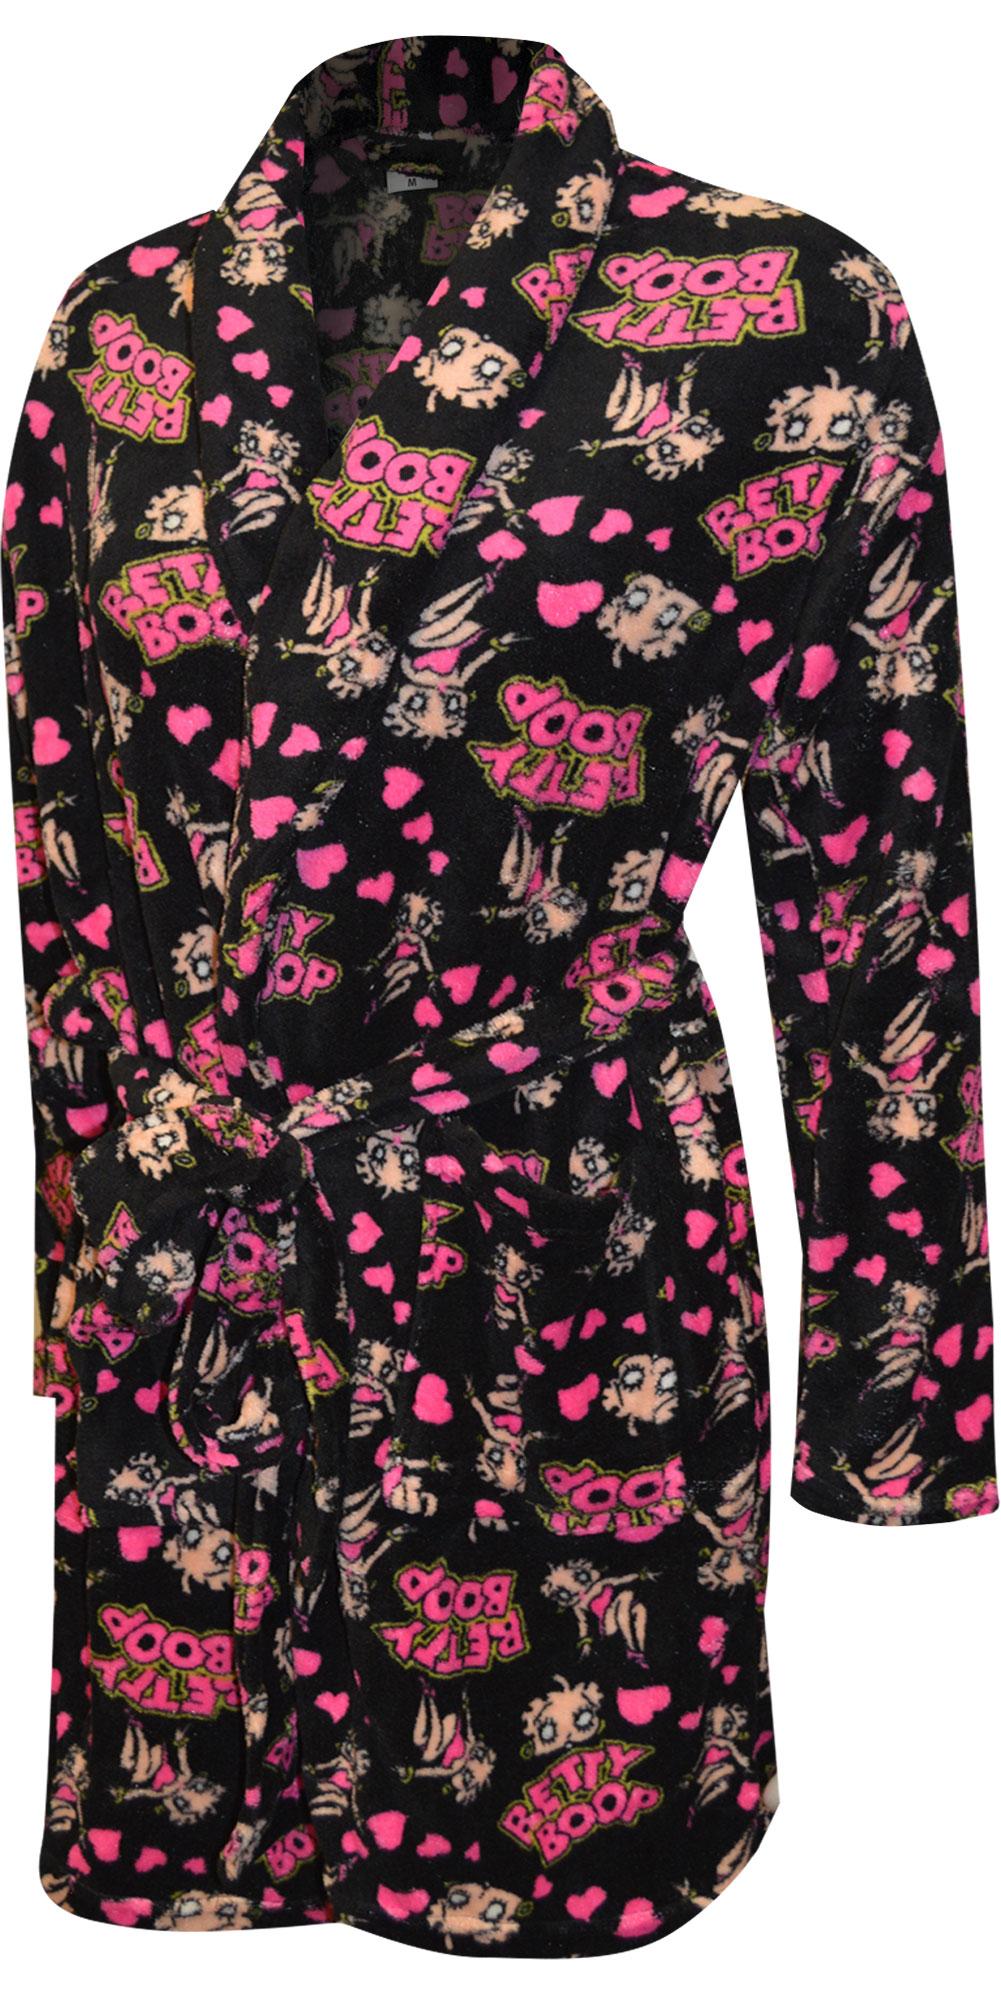 Image of Betty Boop Black Super Soft Plus Size Plush Robe for women